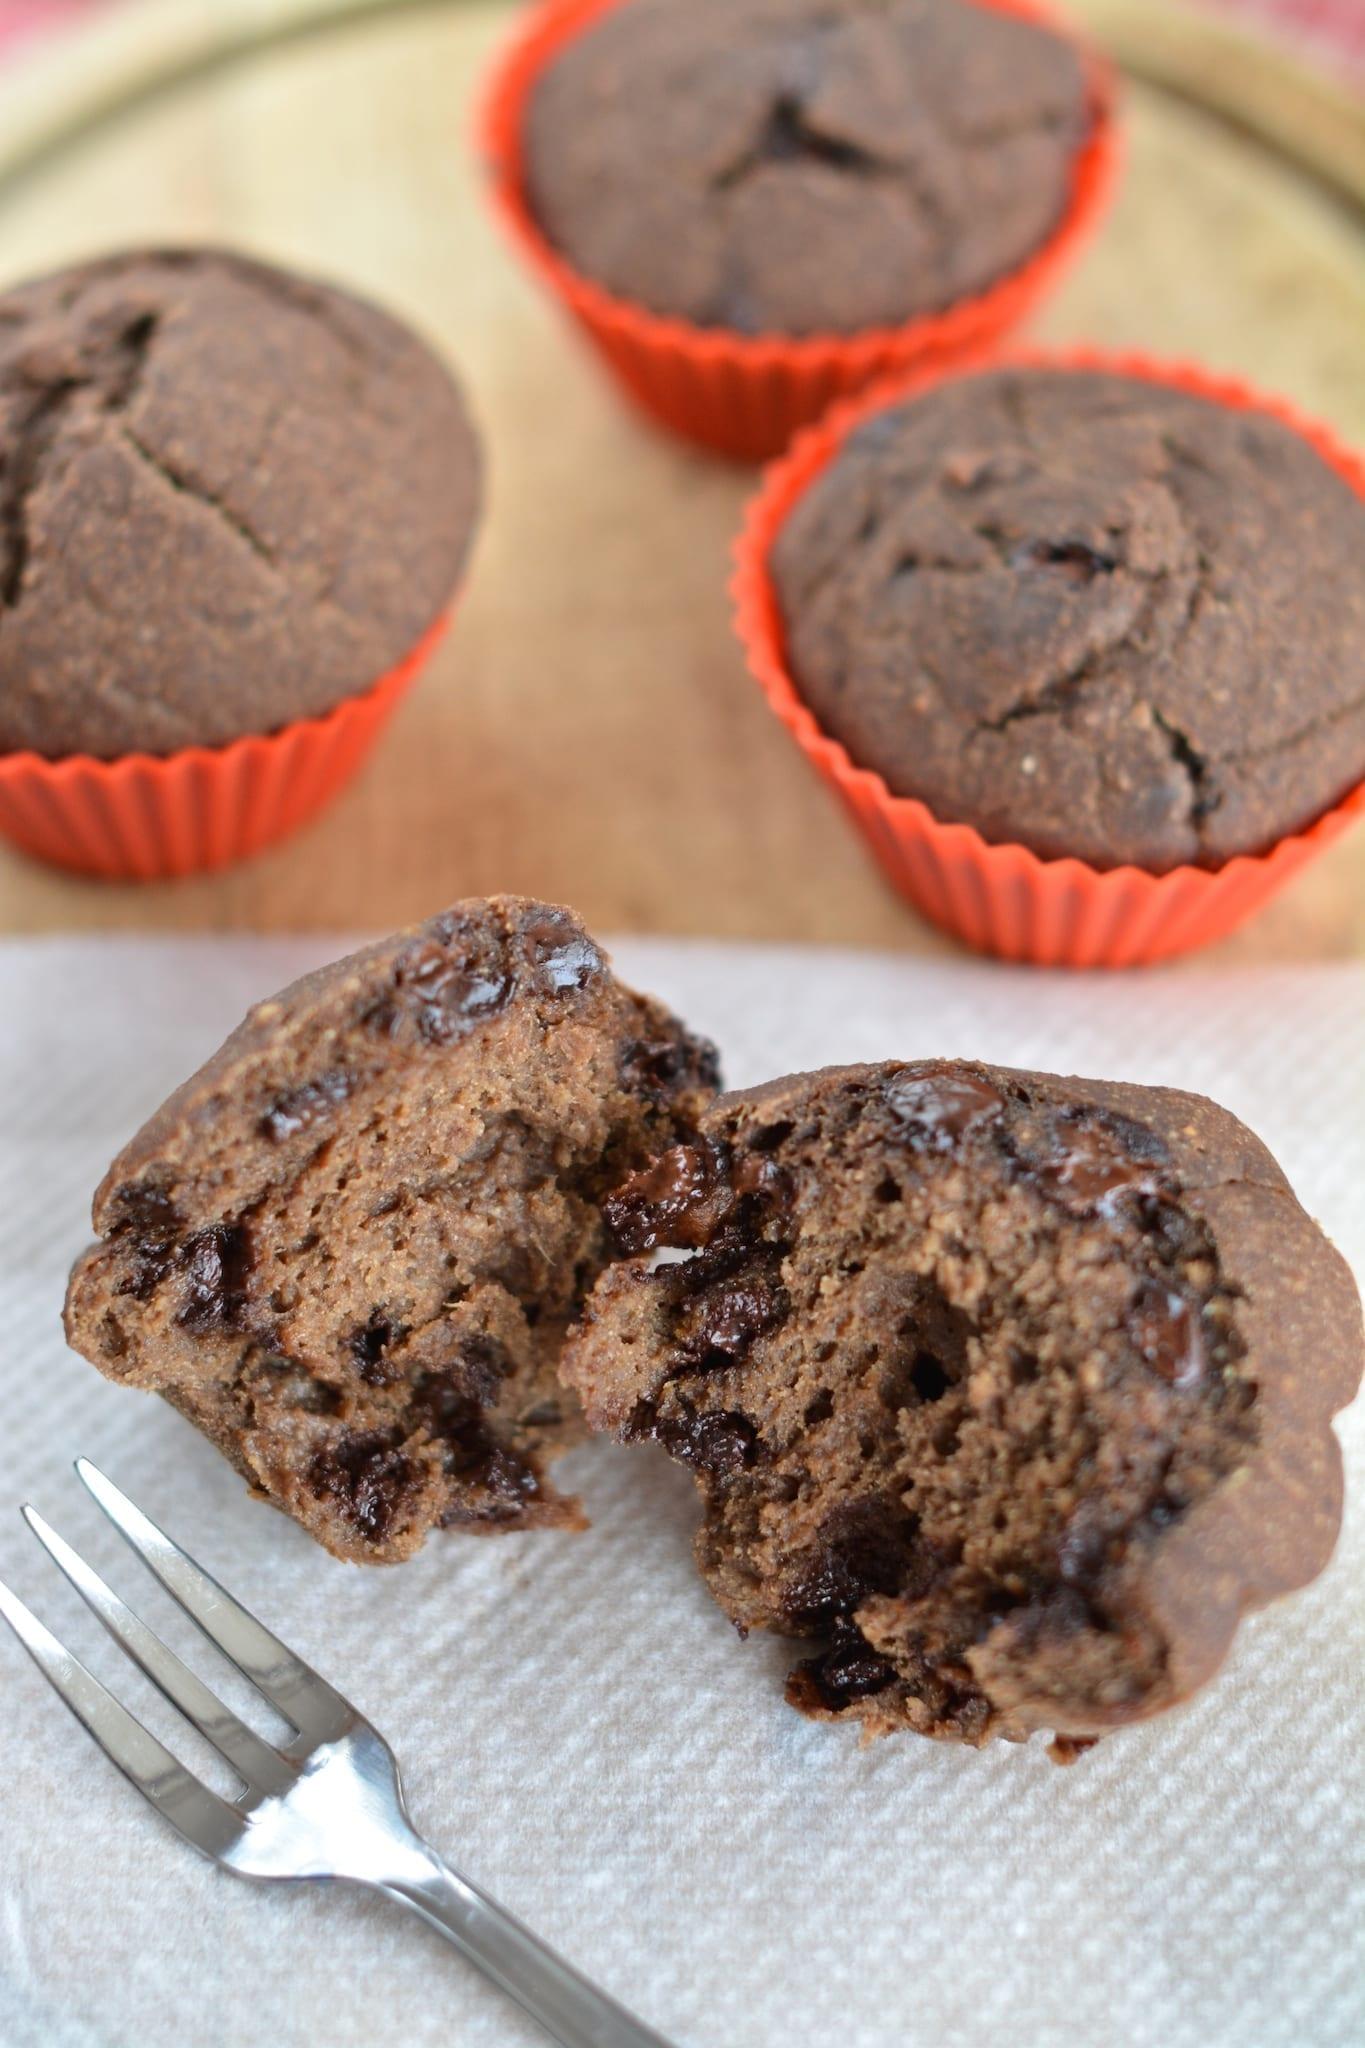 Banana-Mango-Chocolate Muffins, Date-Free and Sugar-Free